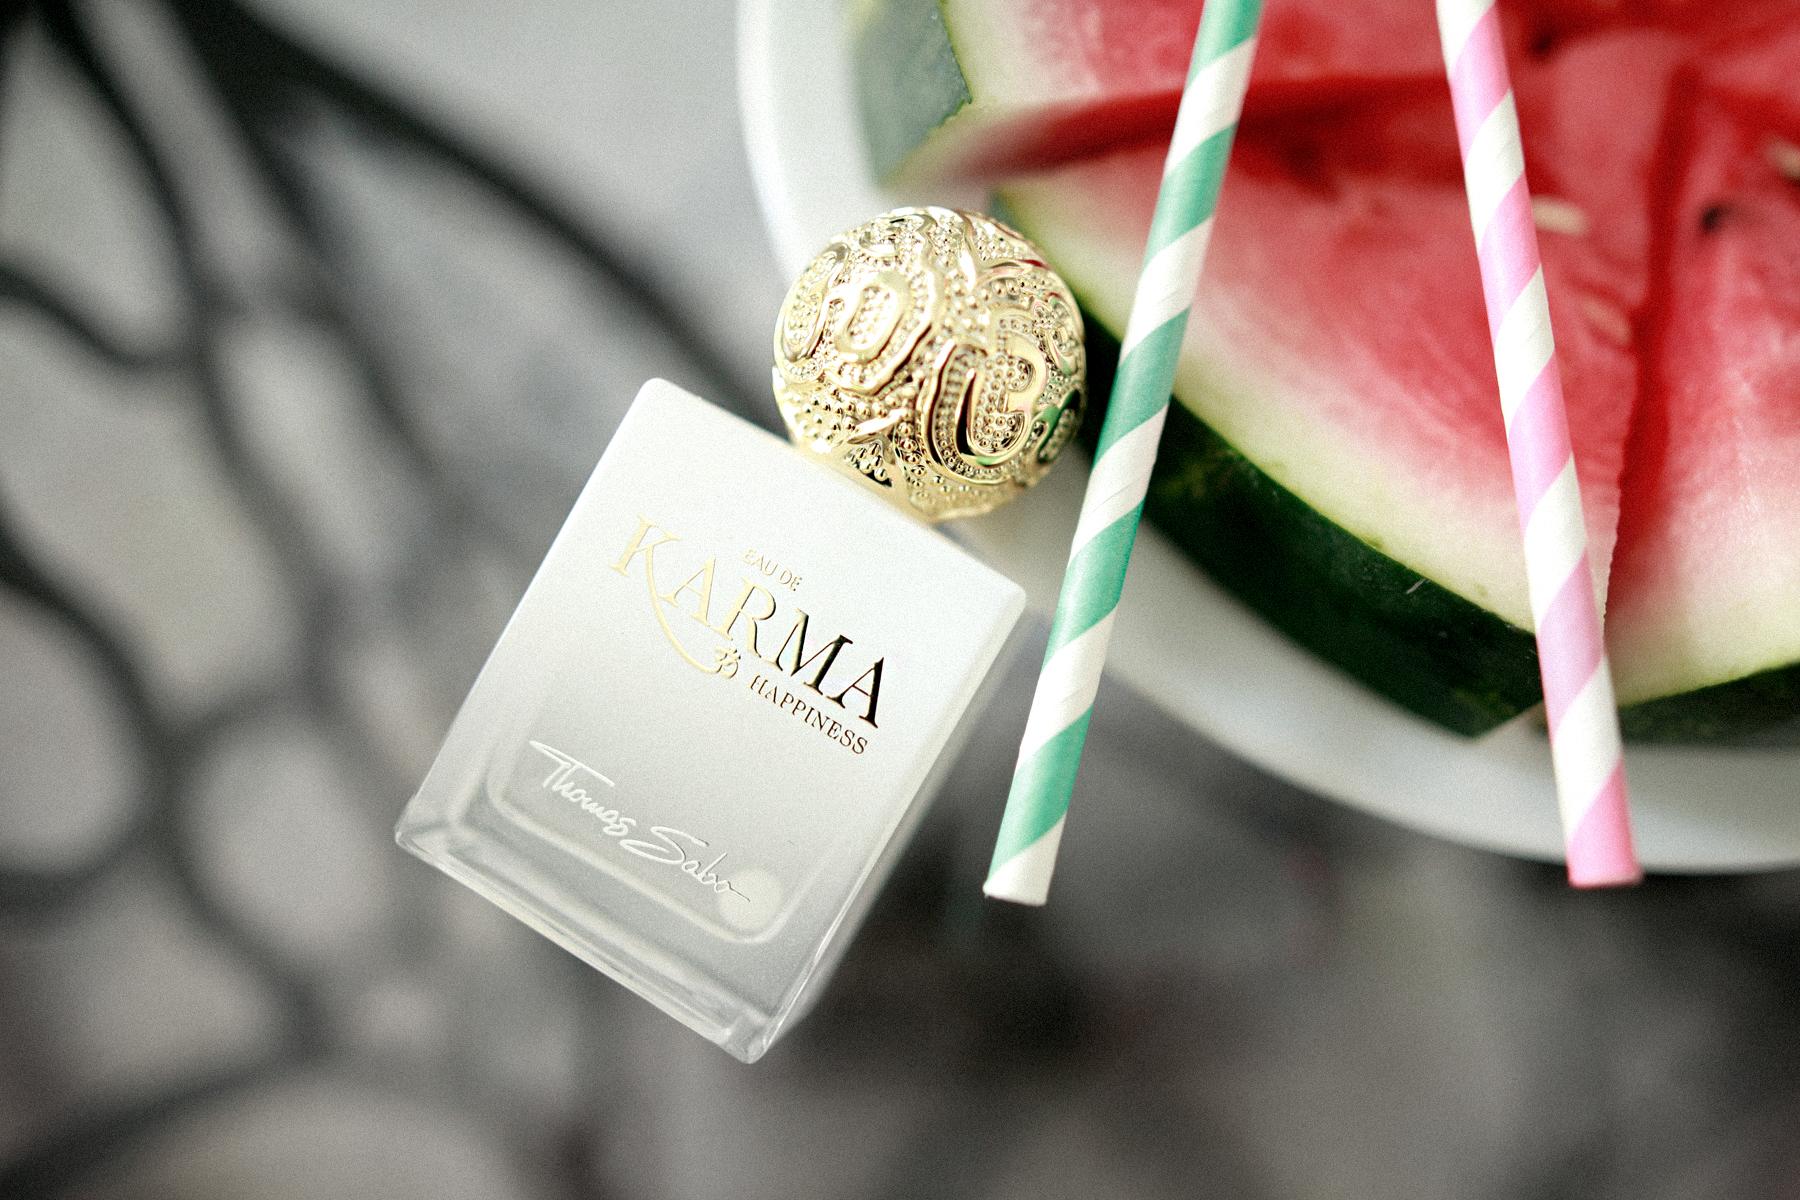 perfumes parfüms parfums summer edition thomas sabo happiness eau de karma elie saab ysl mon paris guerlain issey miyake l'occitane cats & dogs beautyblog beautyblogger düsseldorf germany luxury blog blogger ricarad schernus luxe blogger duft watermelon 1